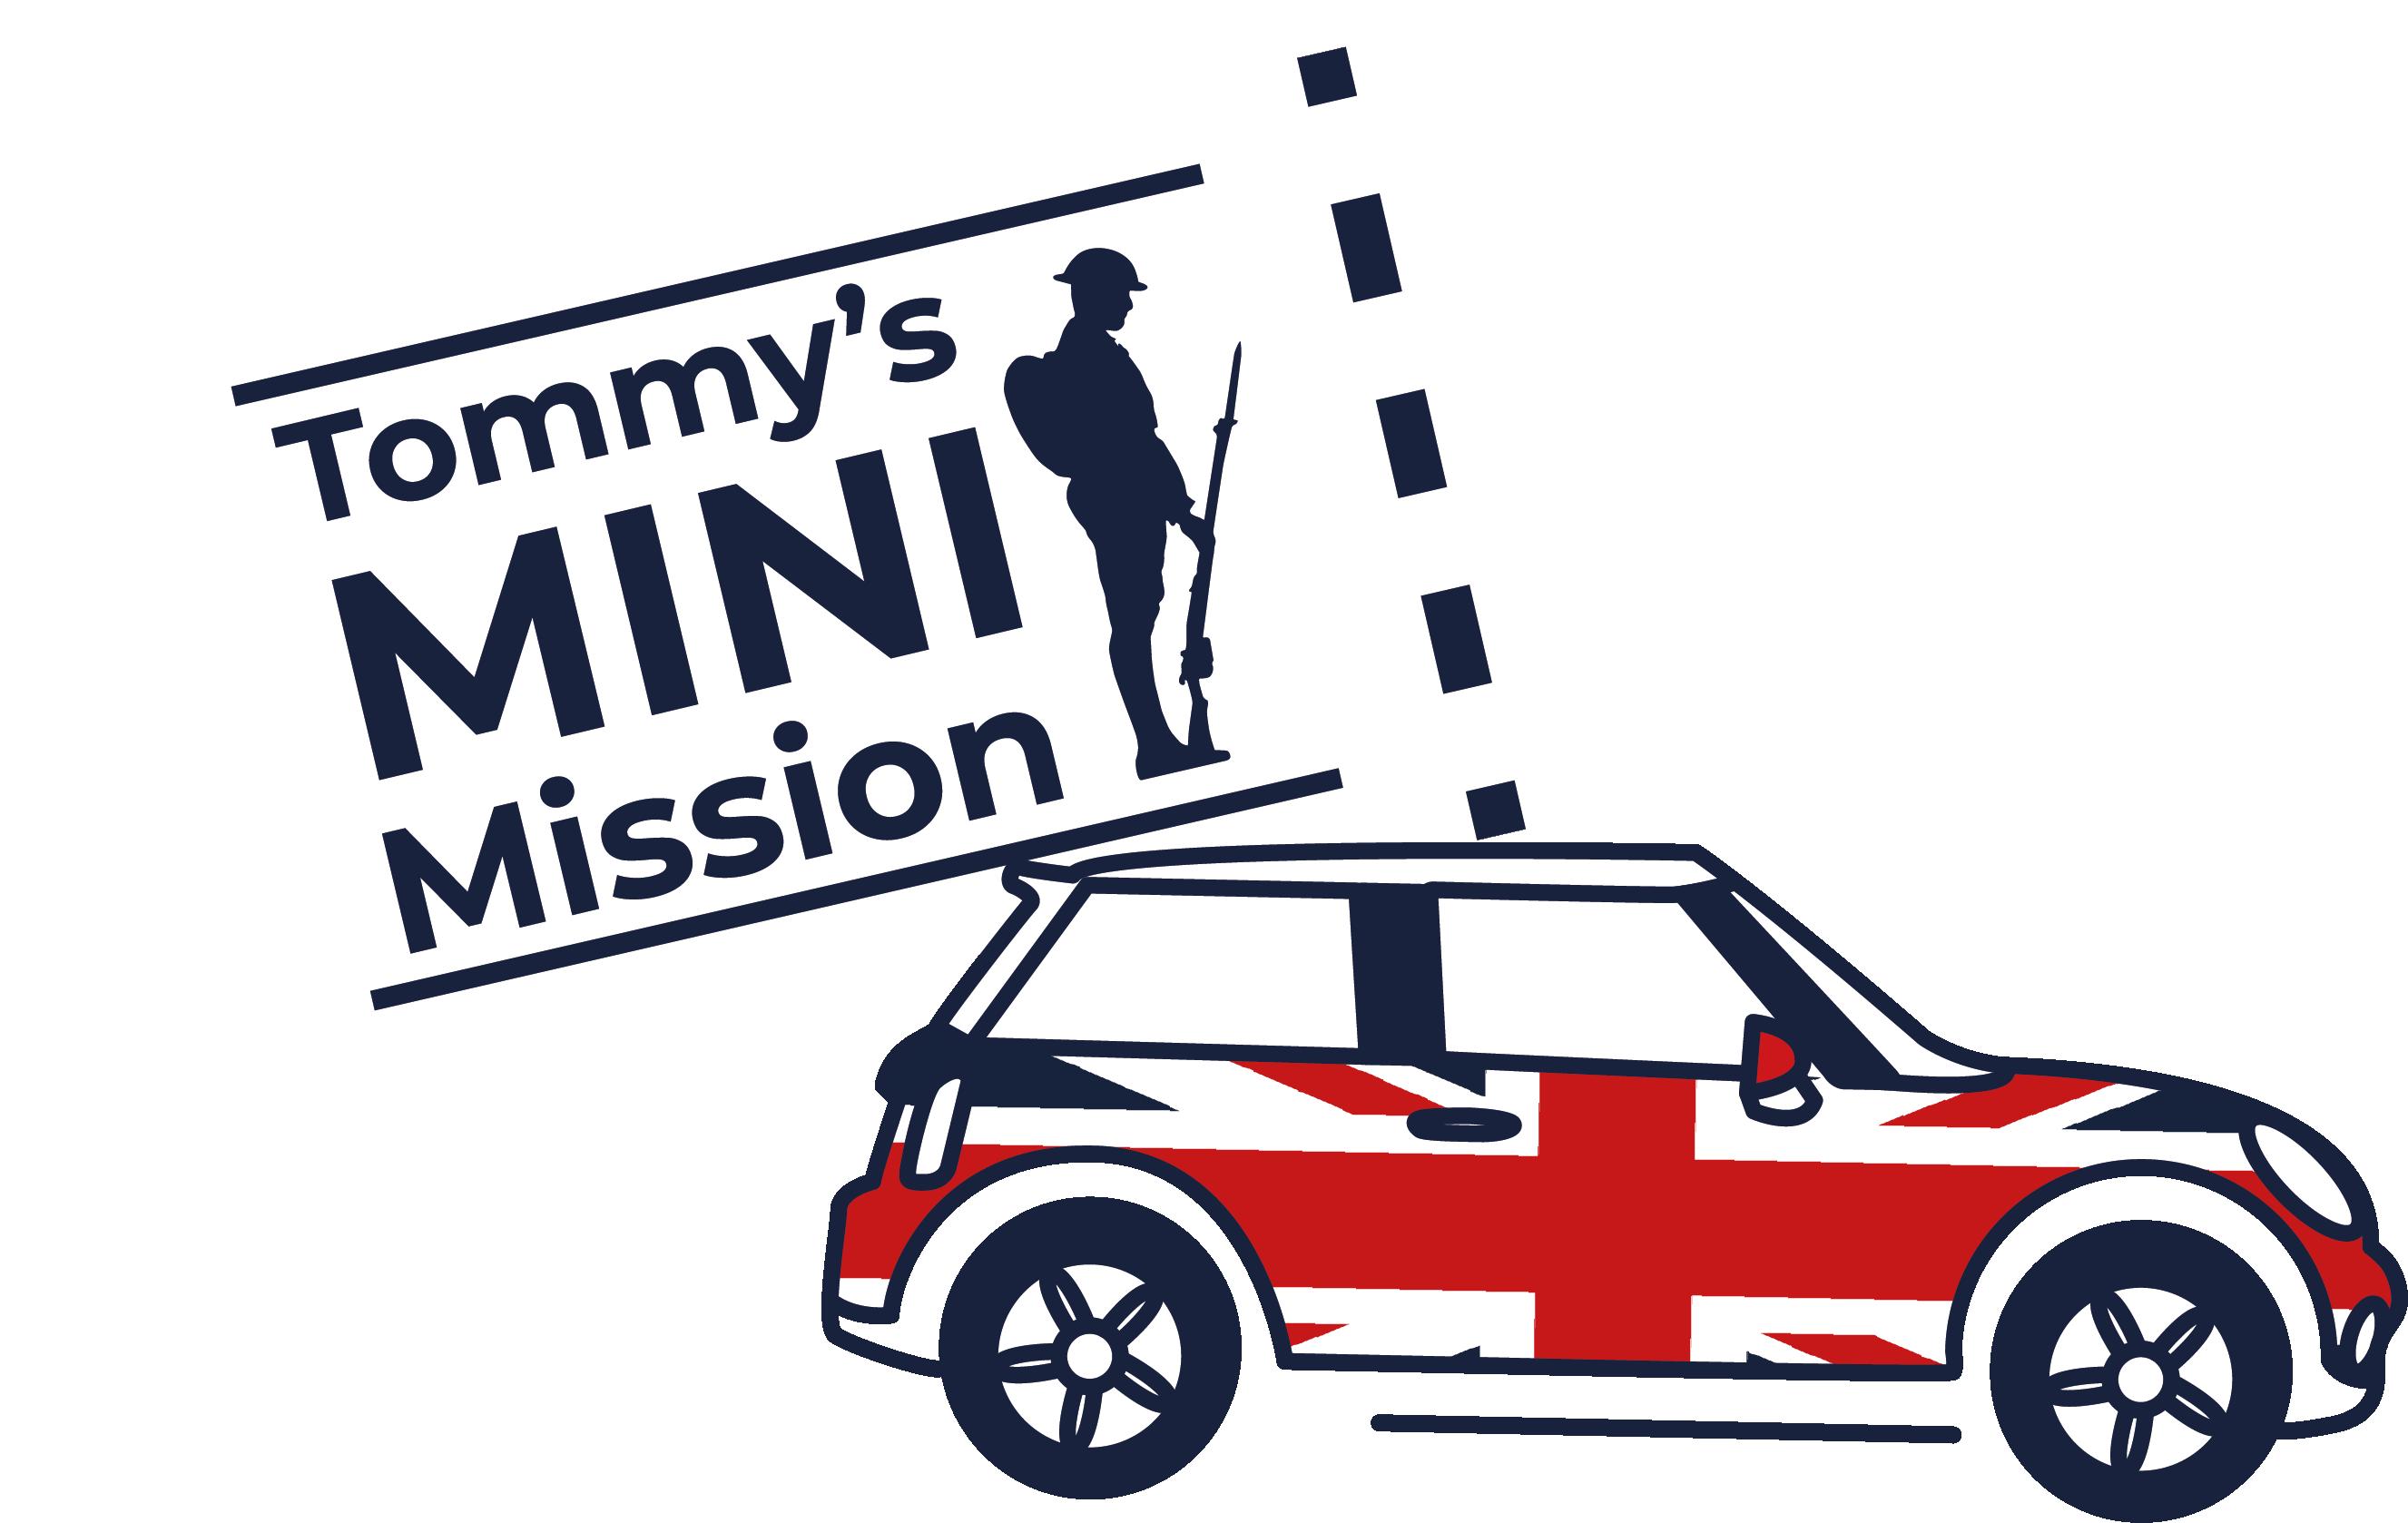 RBLI Fundraising Tommys Mini Mission